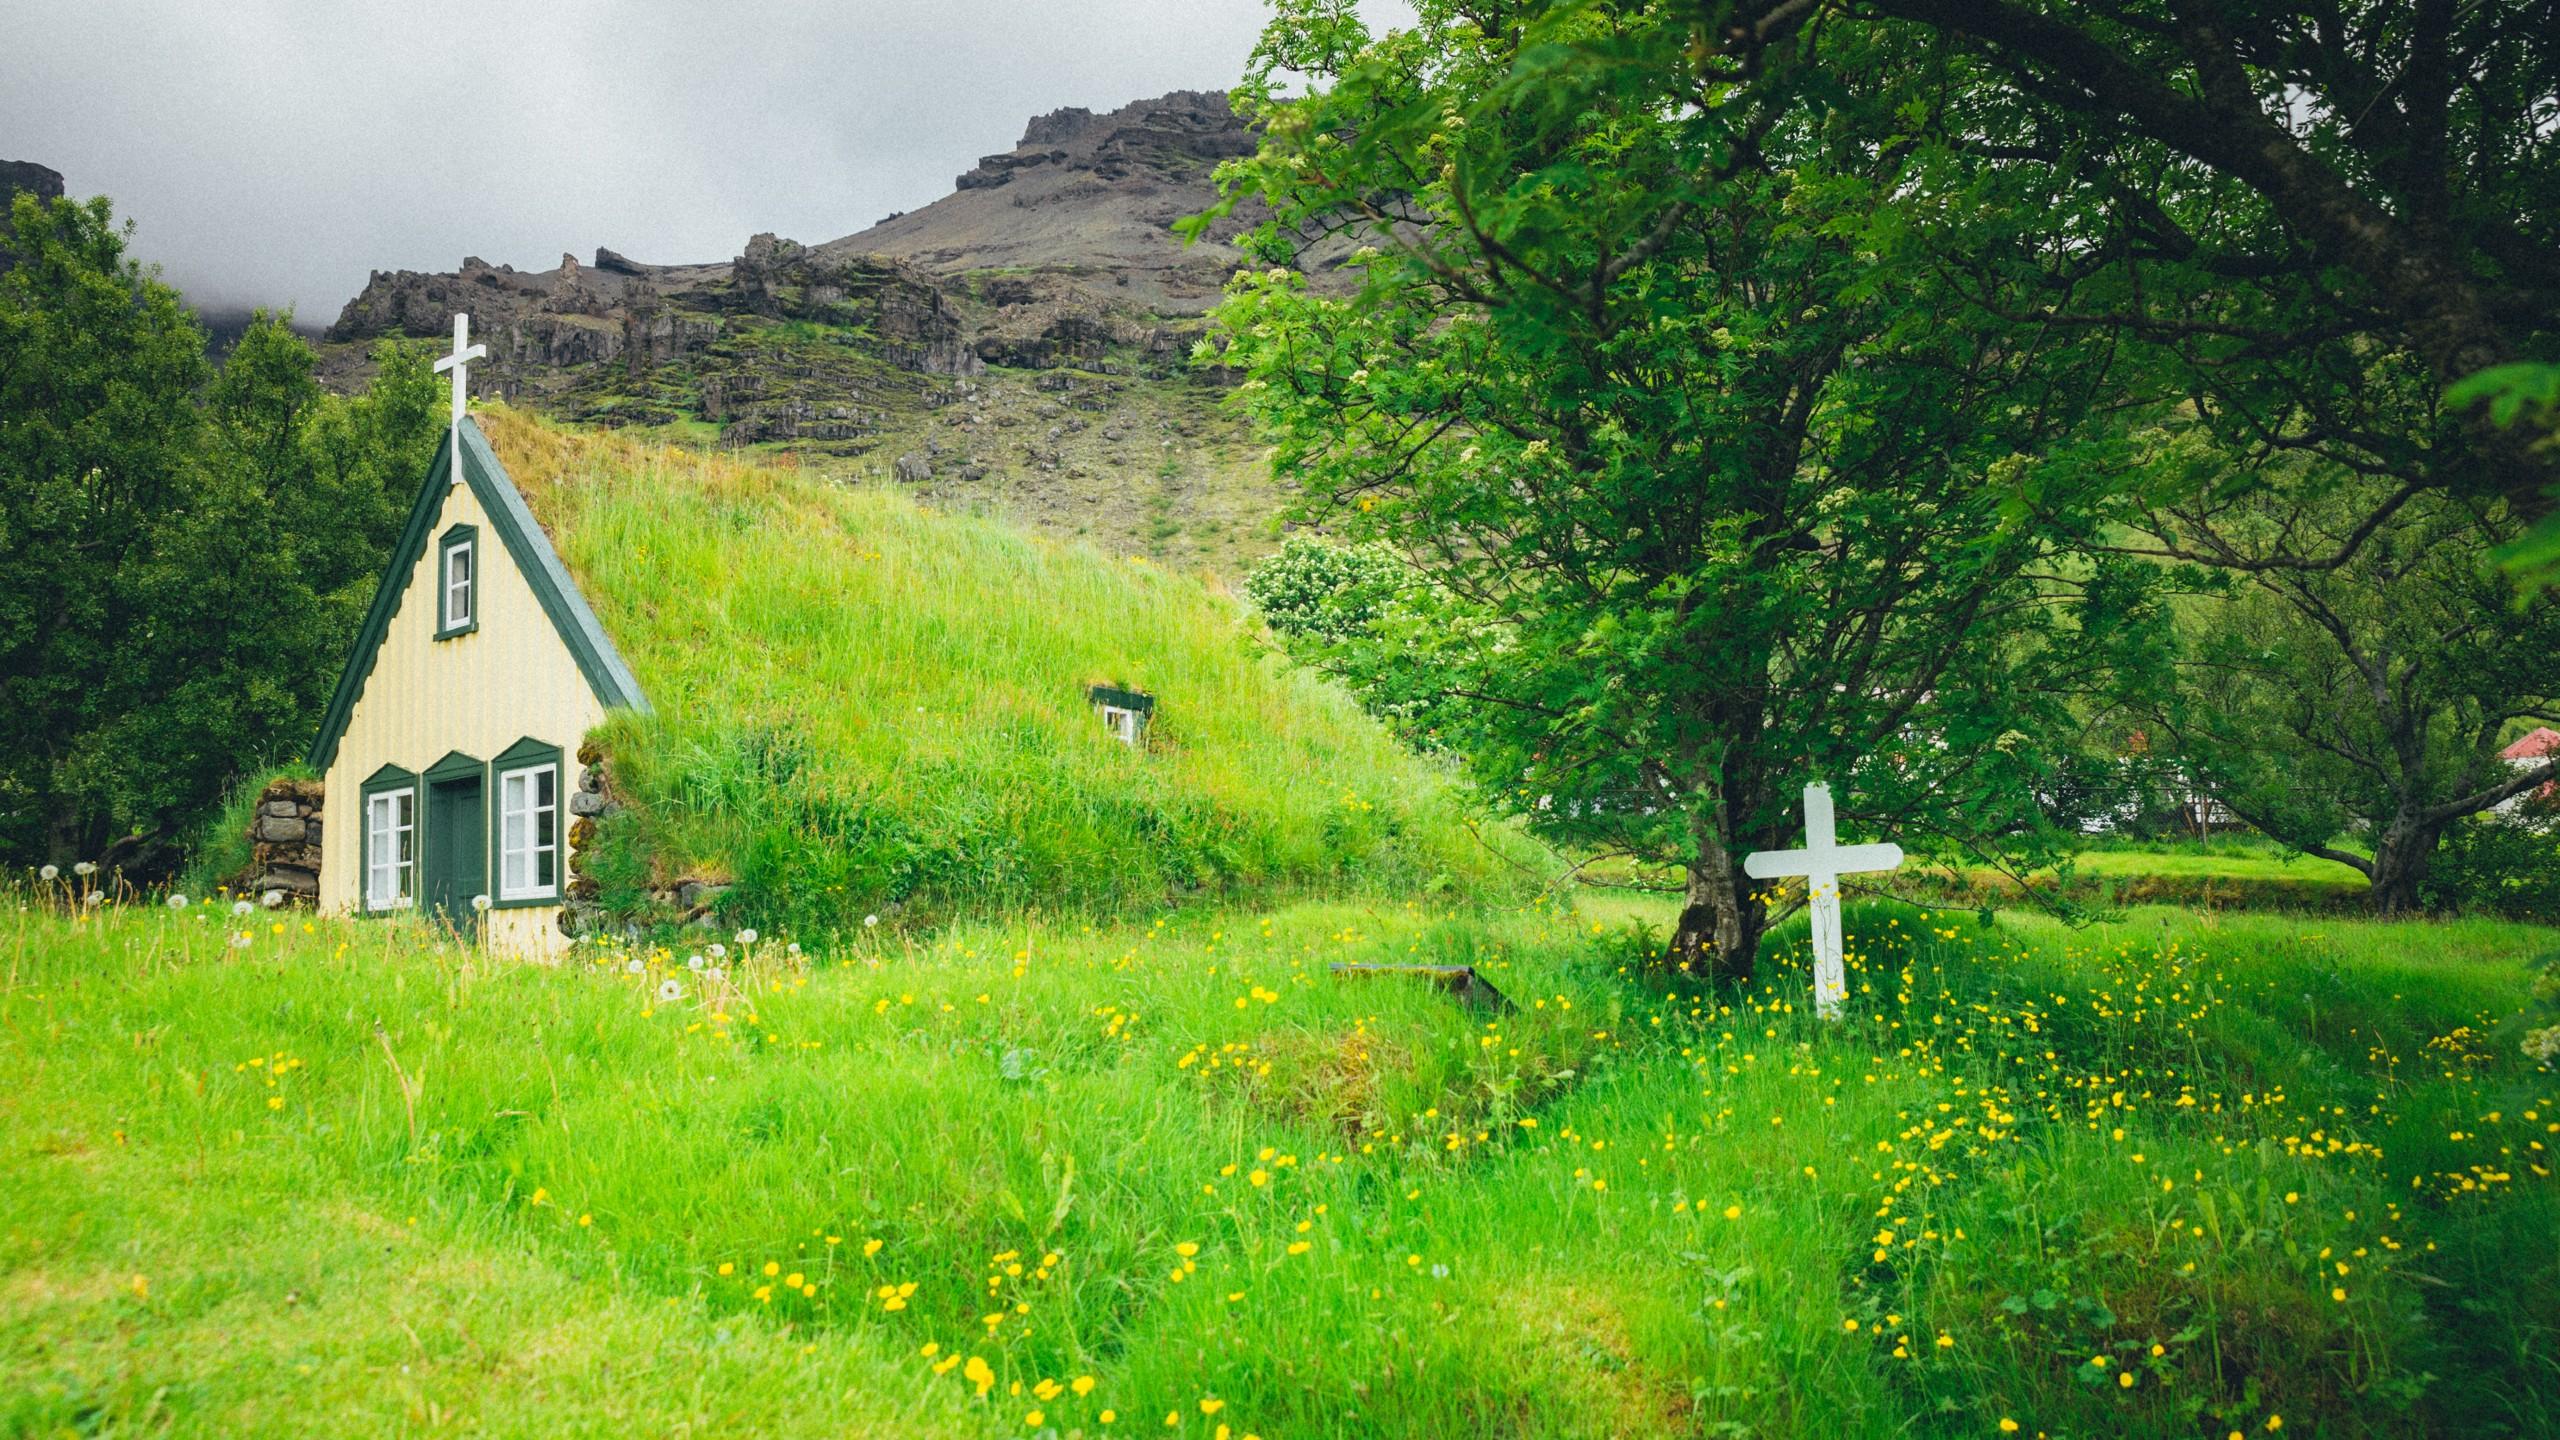 Wyprawa Islandia – Kraina Lodu i Ognia